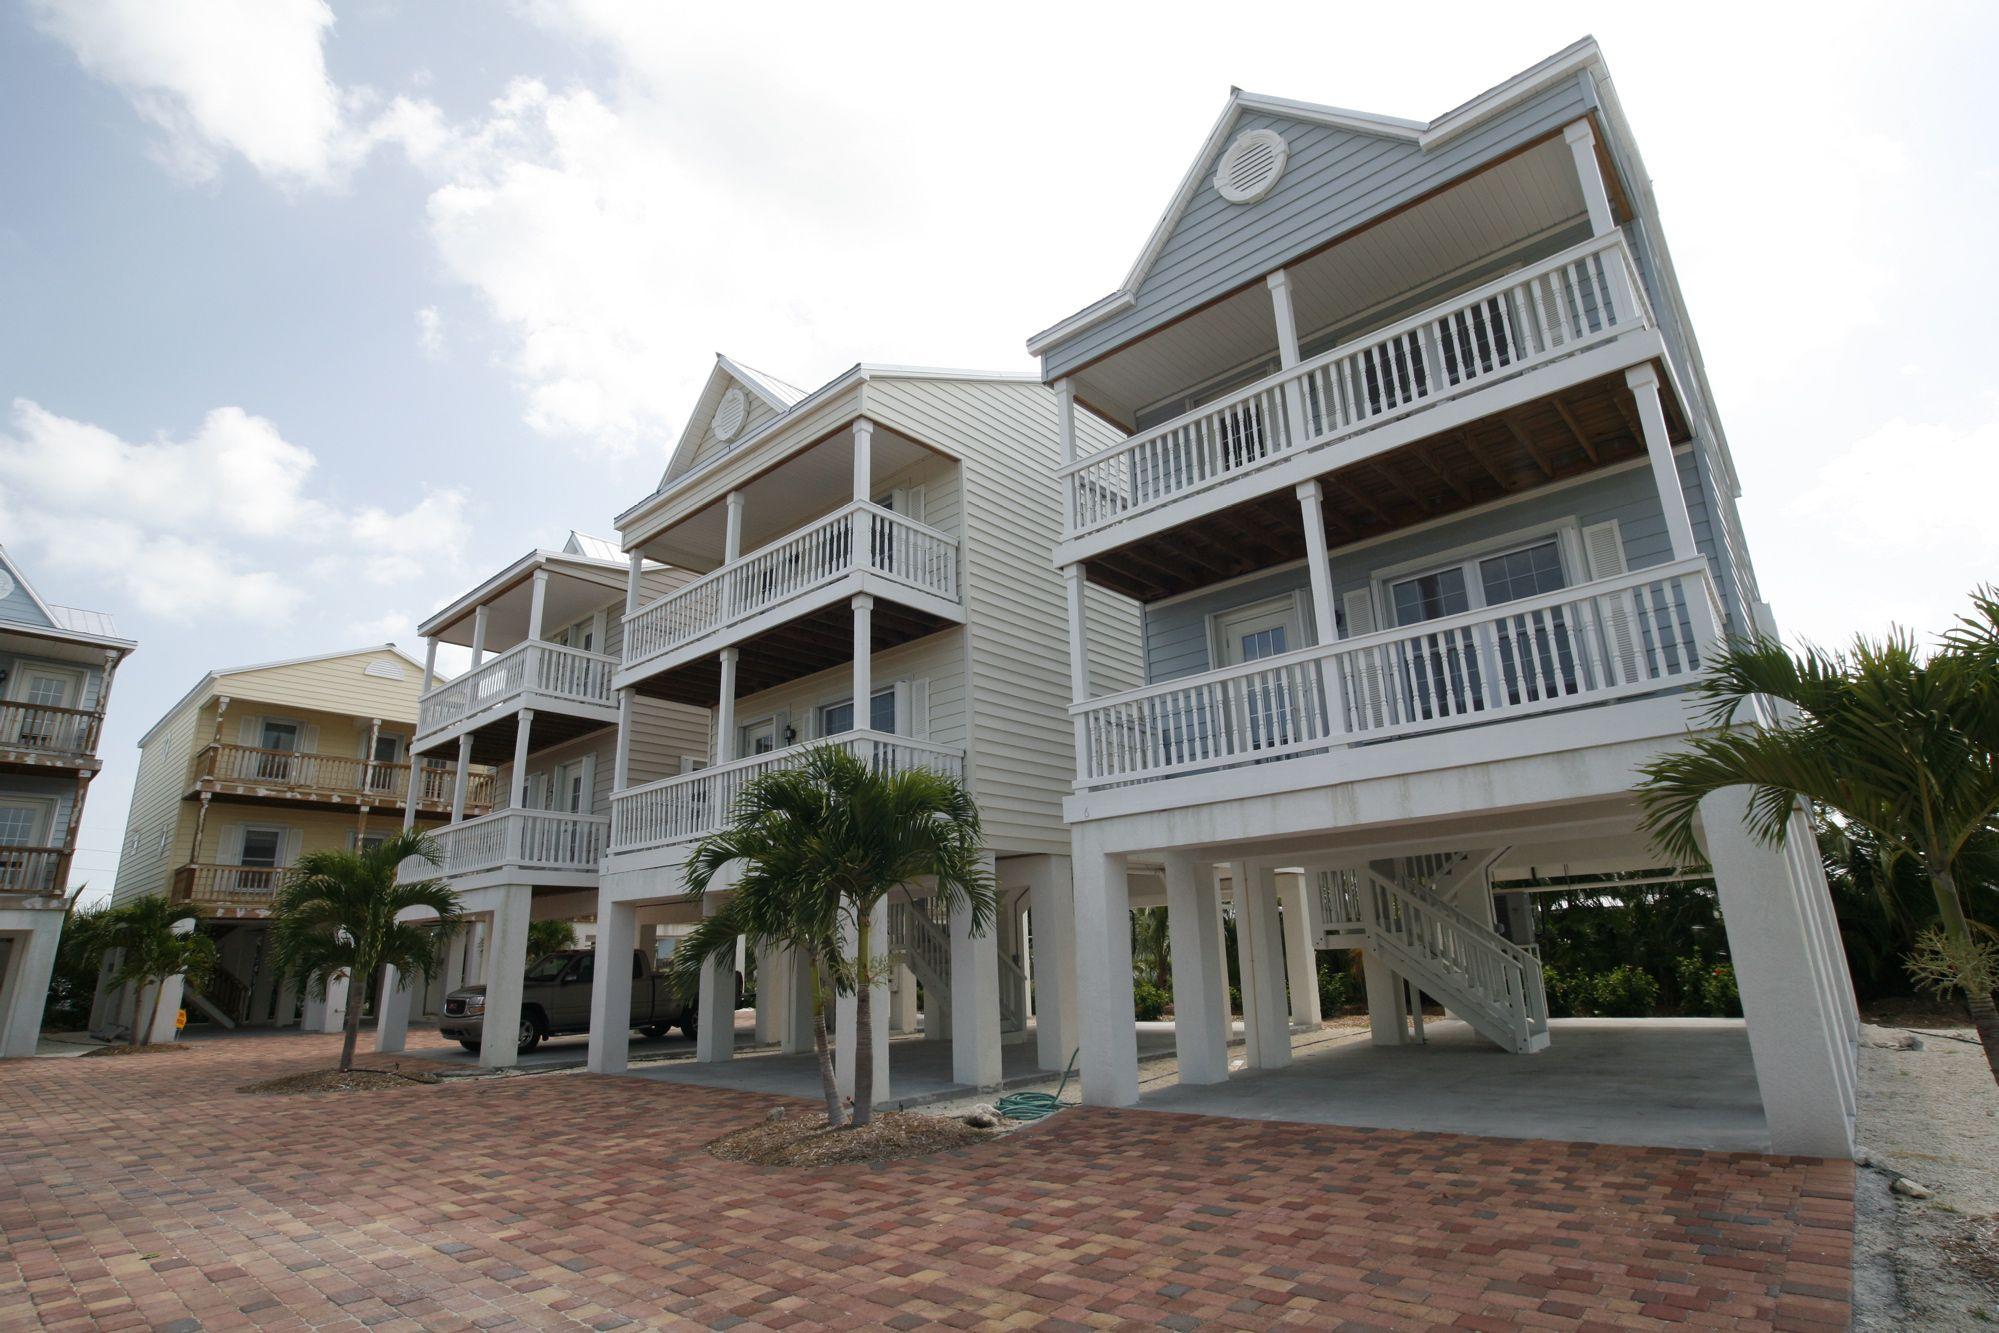 A few modular home designs if you live near the coast for Modular beach house